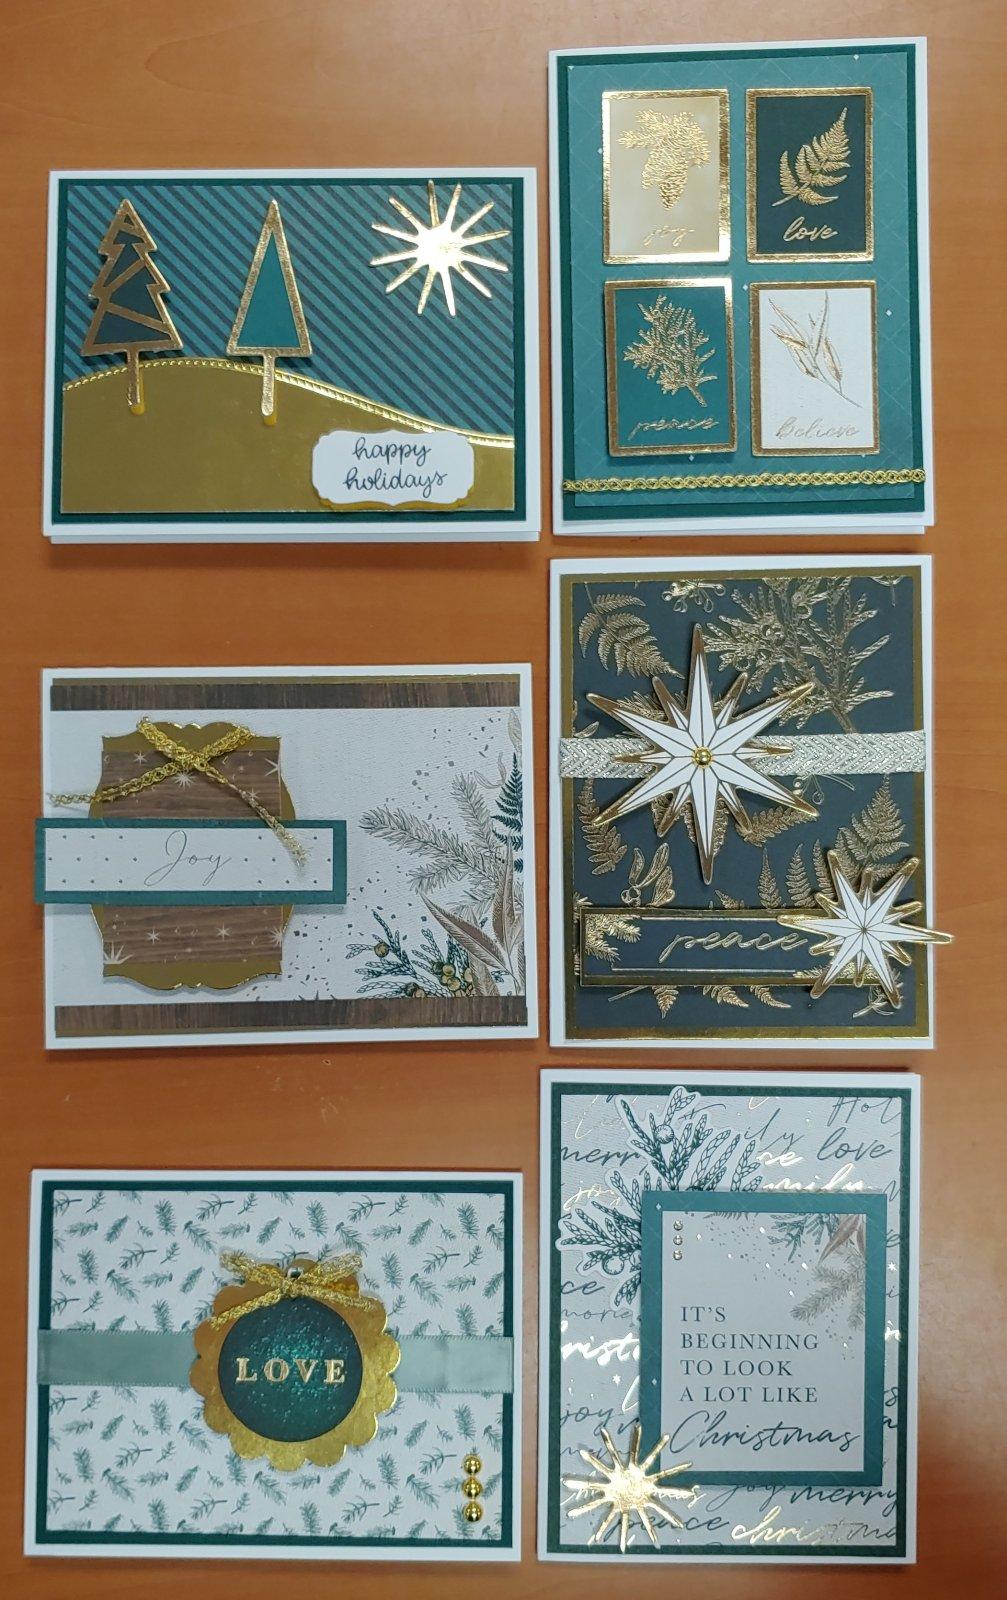 Emerald Eve Christmas Card Kit